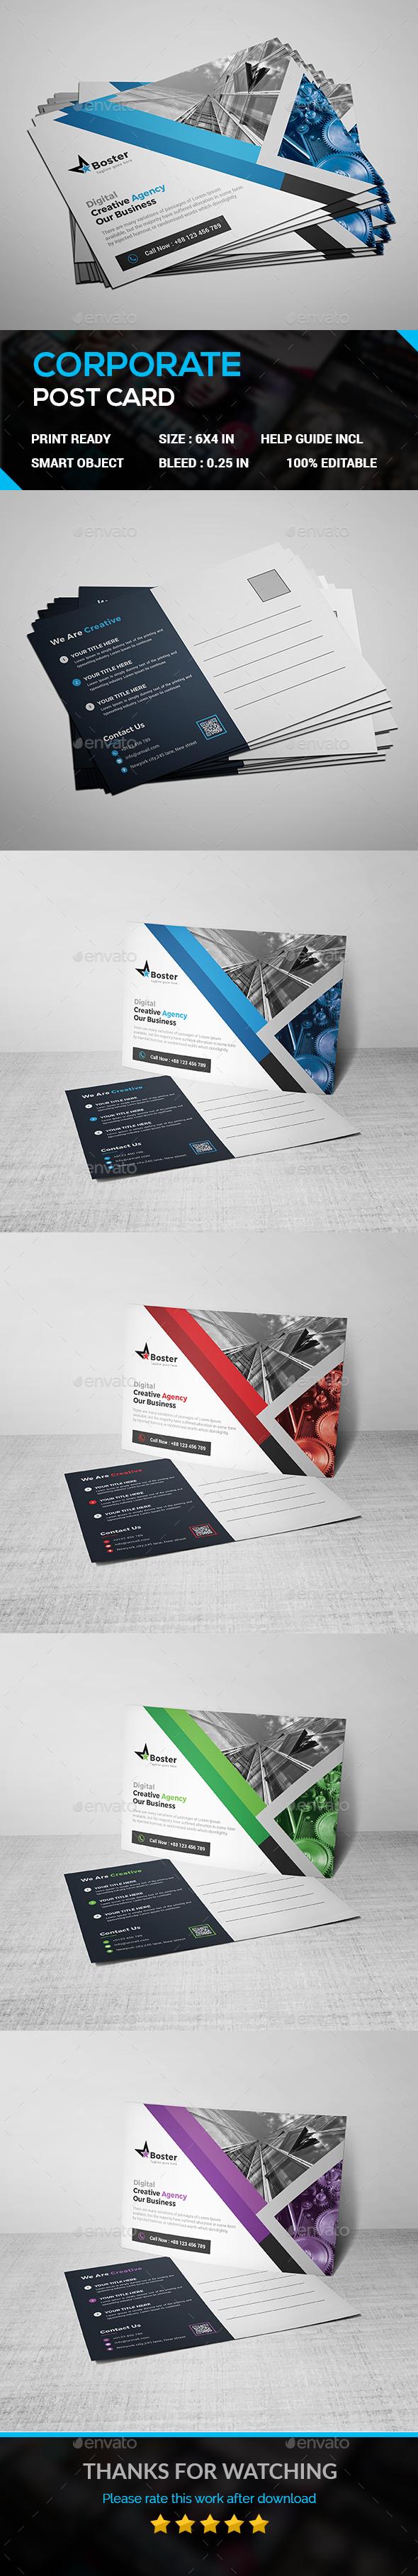 Post Card - Cards & Invites Print Templates